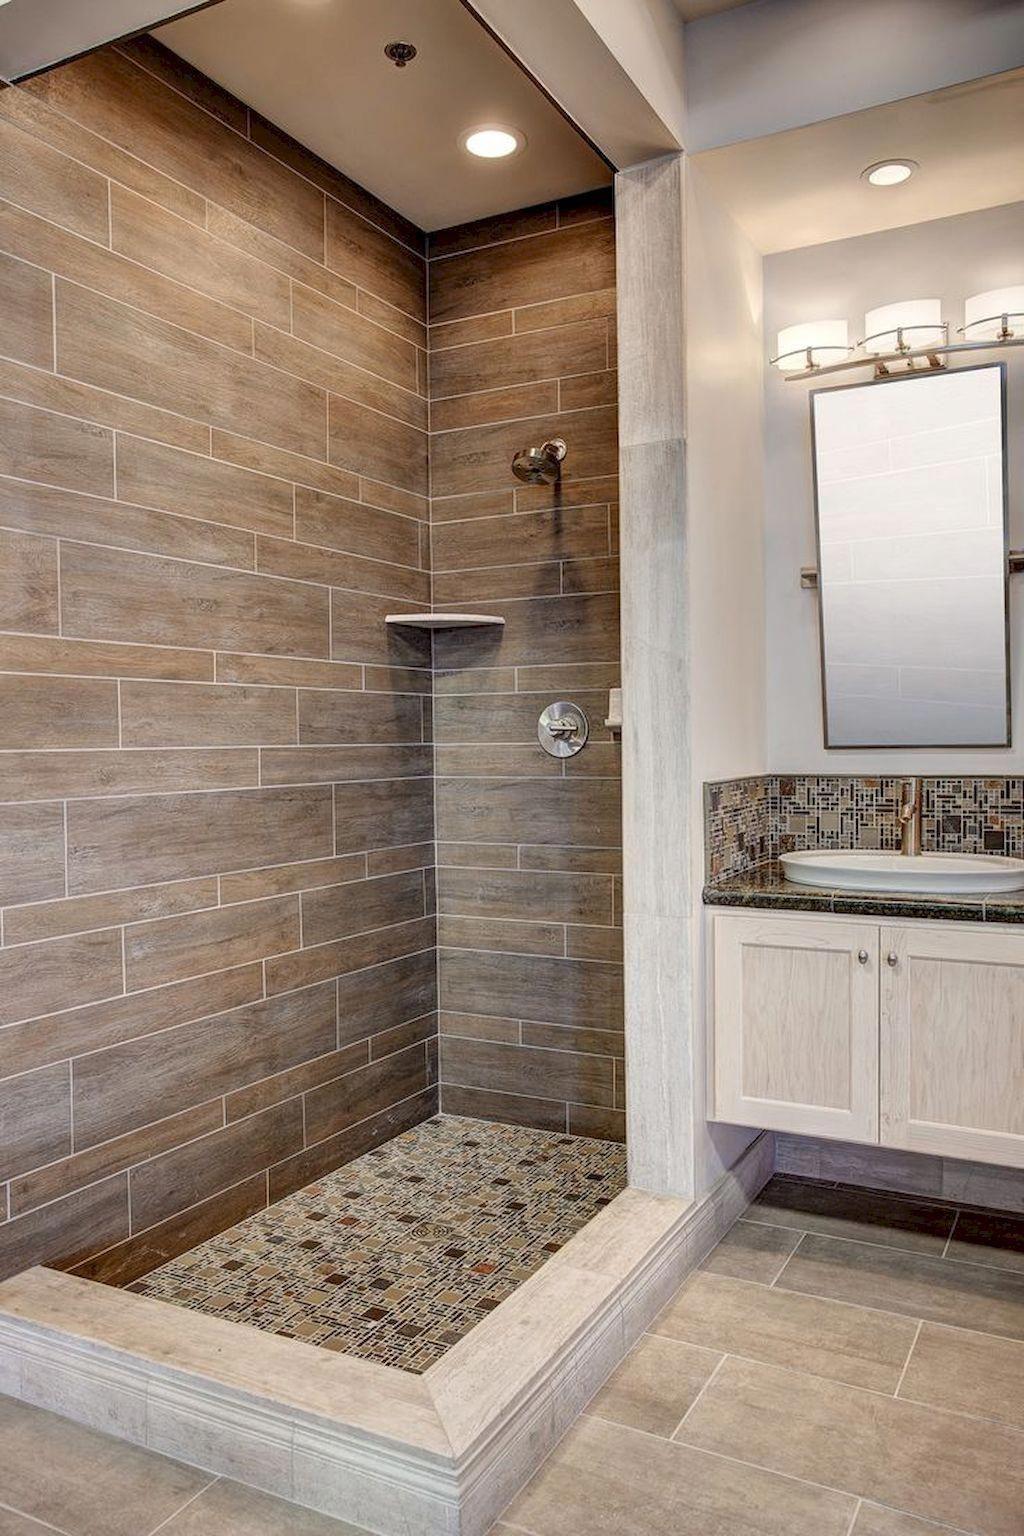 Splendid Photo Whitetilebathroom In 2020 Patterned Bathroom Tiles Tiny House Bathroom Bathrooms Remodel